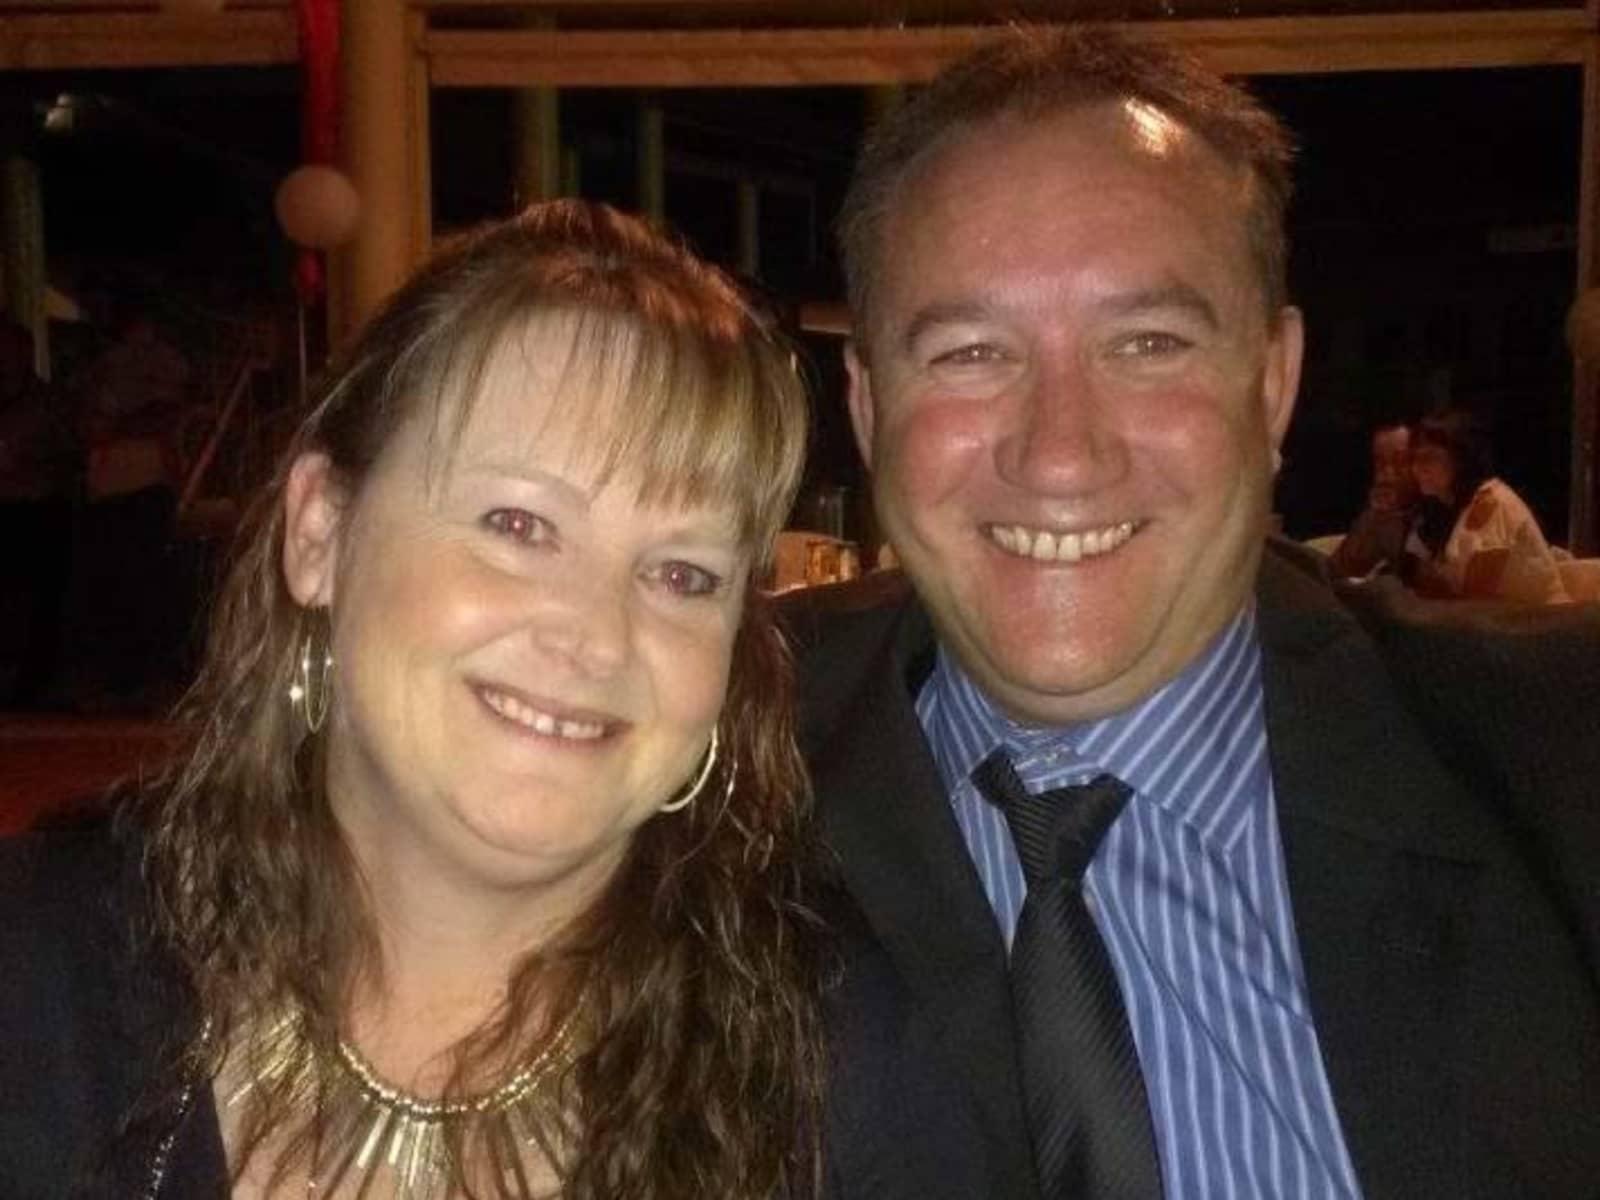 Sally-anne & John from Benalla, Victoria, Australia